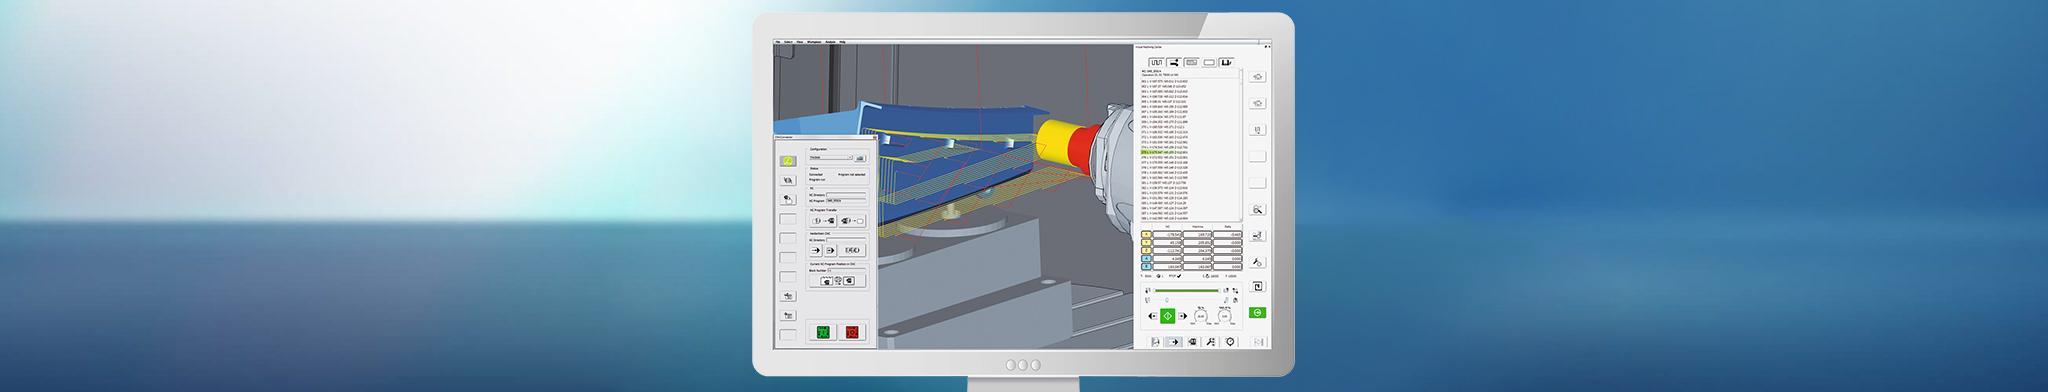 hyperMILL Virtual Machining Slider